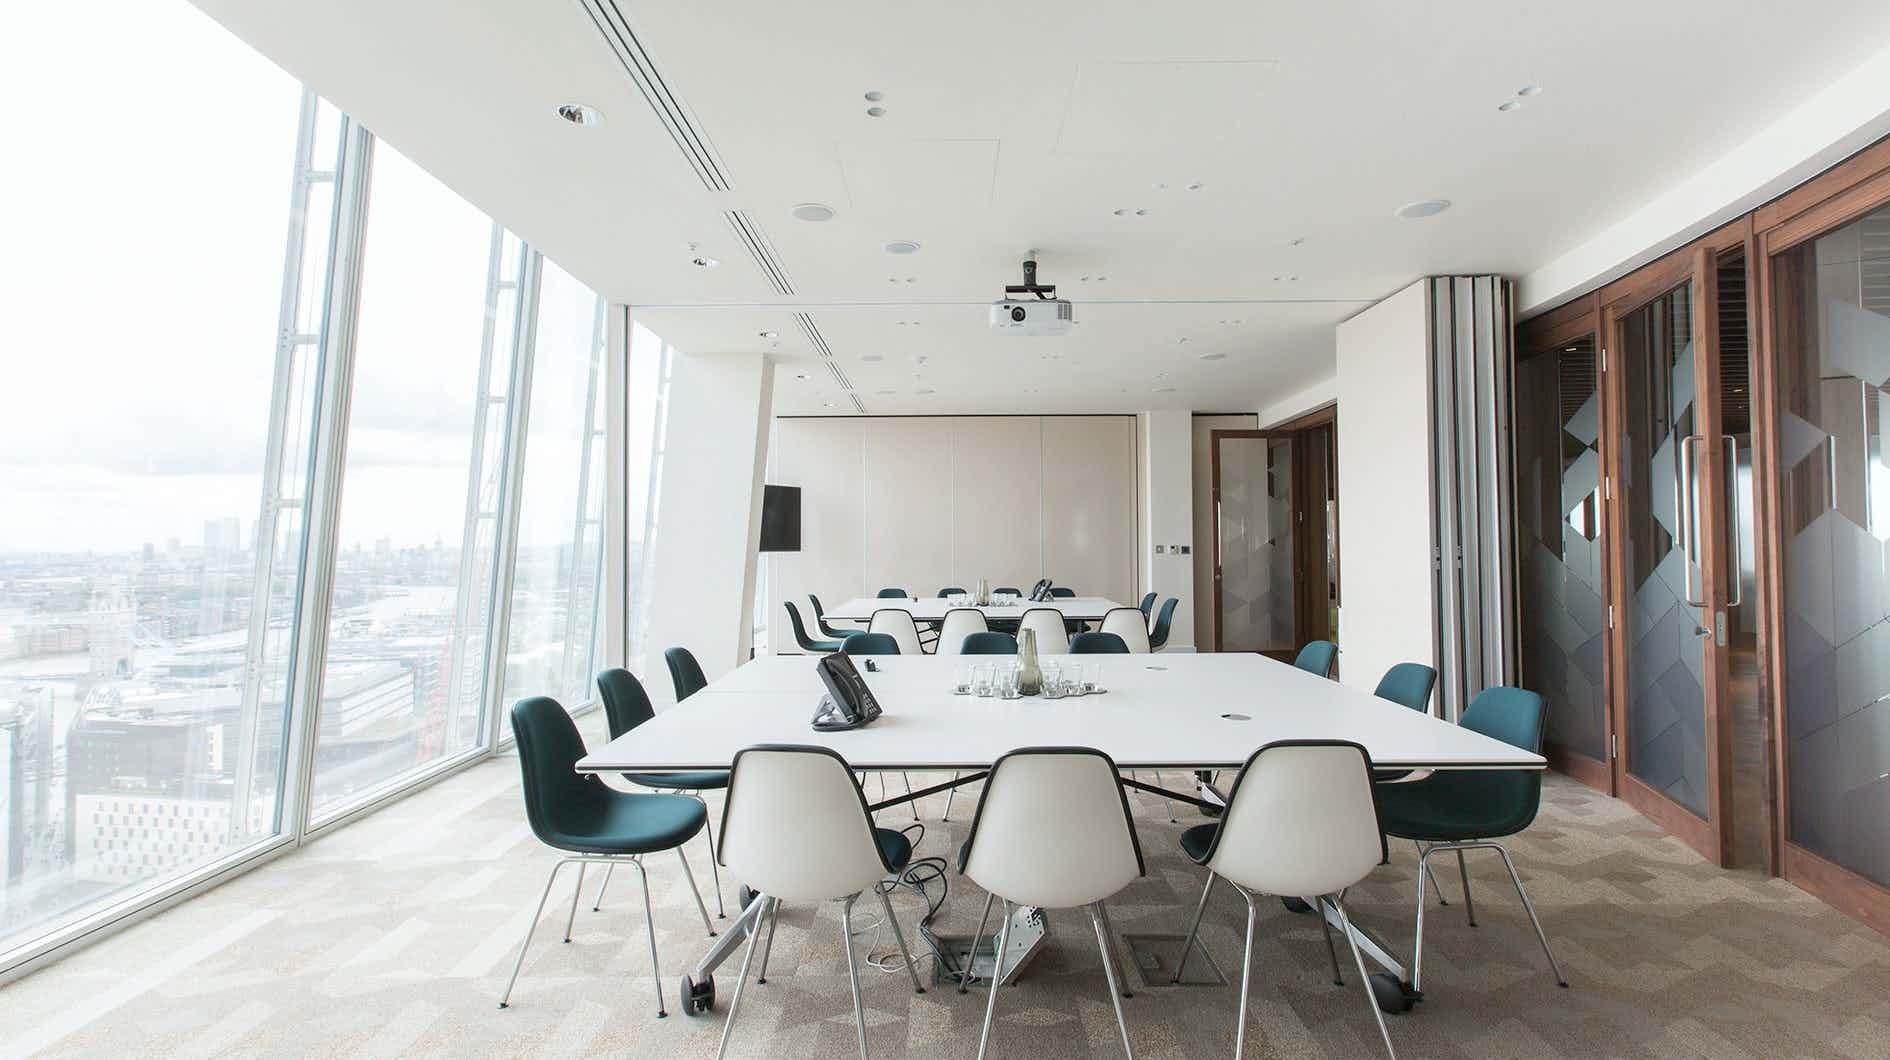 Meeting Room 2 & 3 , TOG, 24/25 The Shard